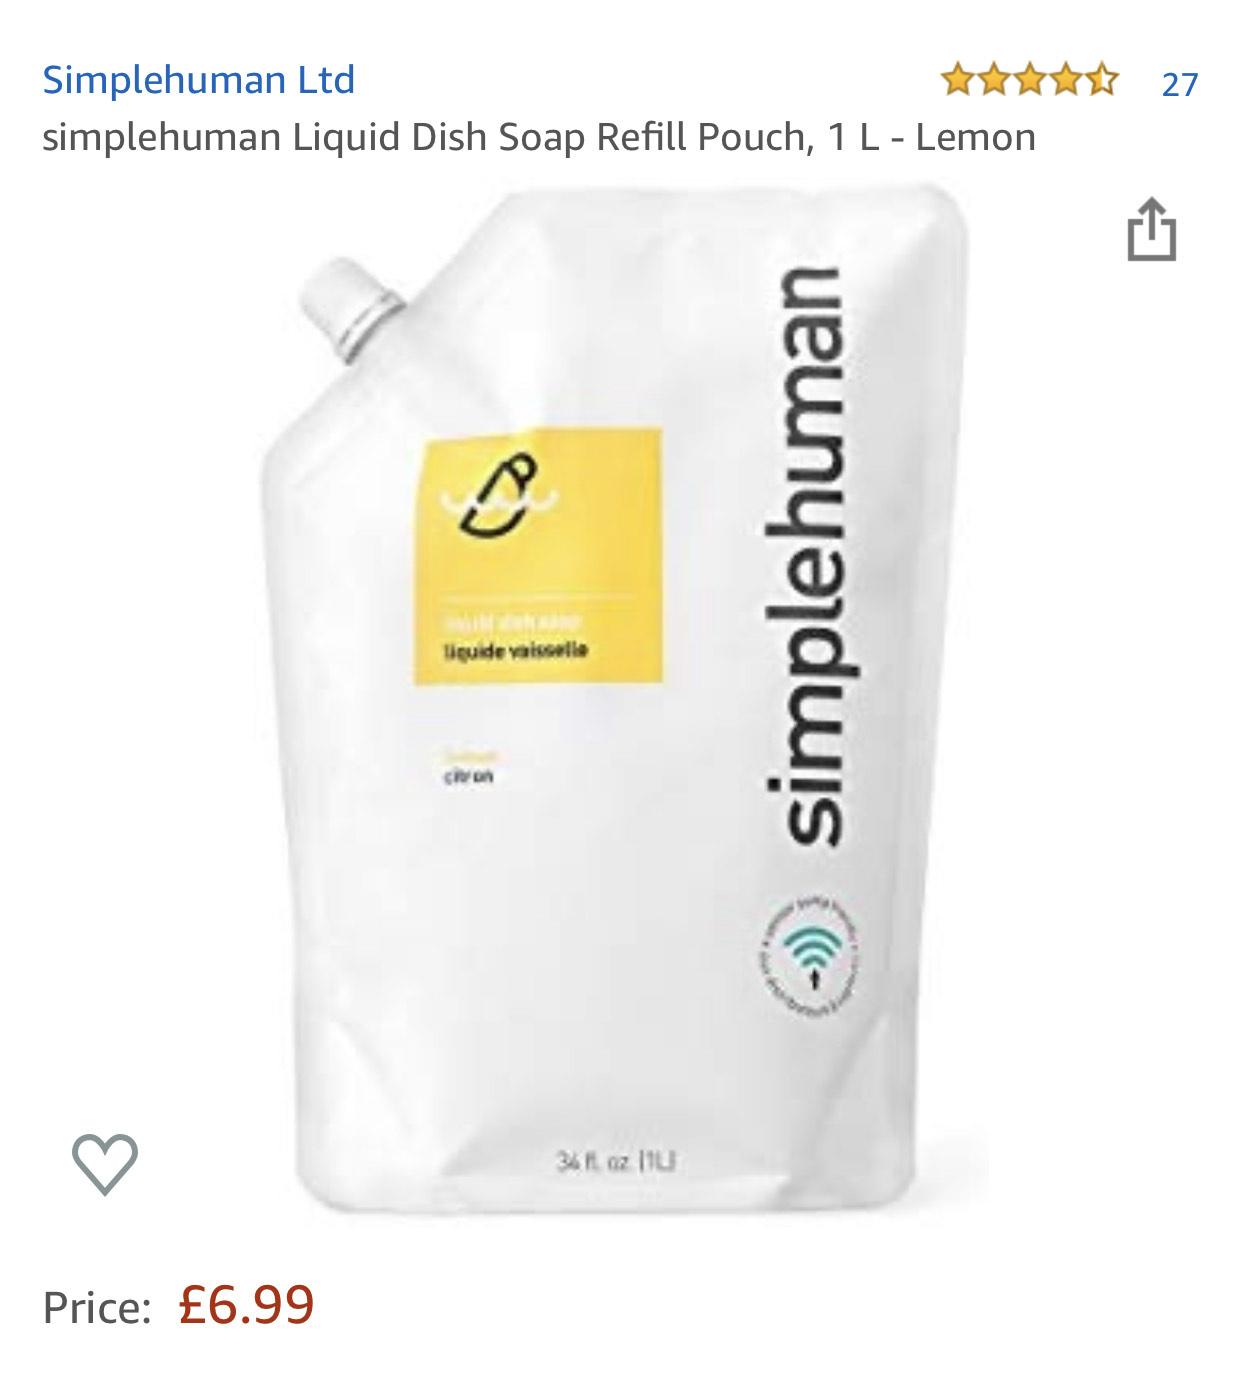 simplehuman Liquid Dish Soap Refill Pouch, 1 L - Lemon £6.99 (Prime) / £11.48 (non Prime) at Amazon